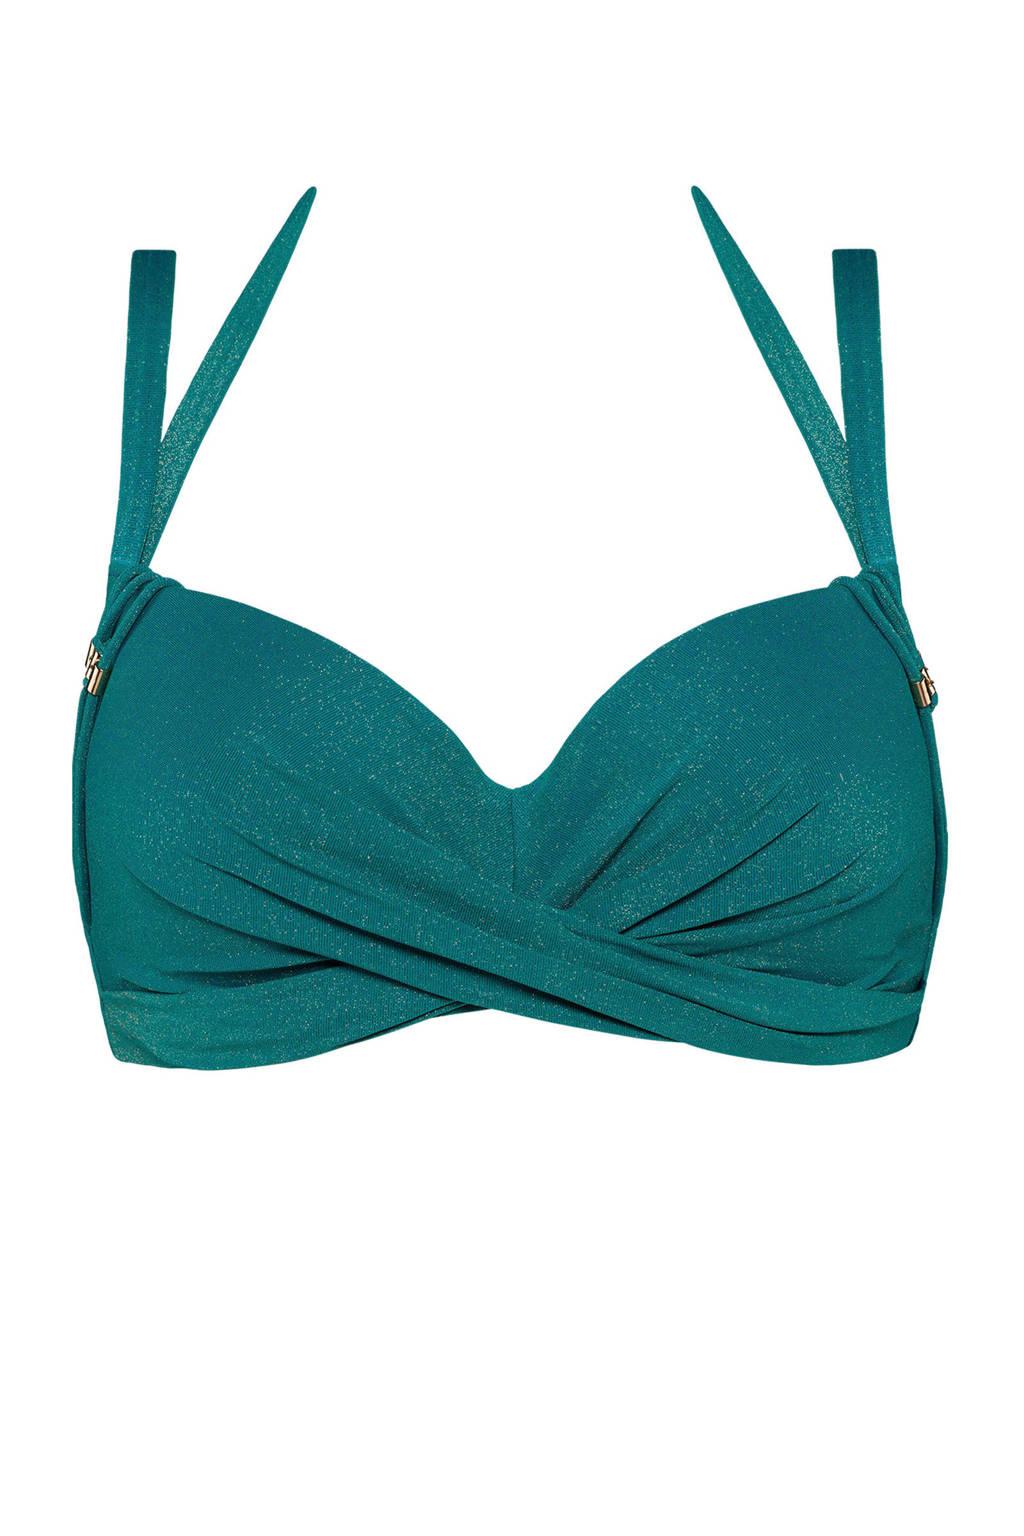 marlies dekkers halter bikinitop Holi Gypsy groen, Groen